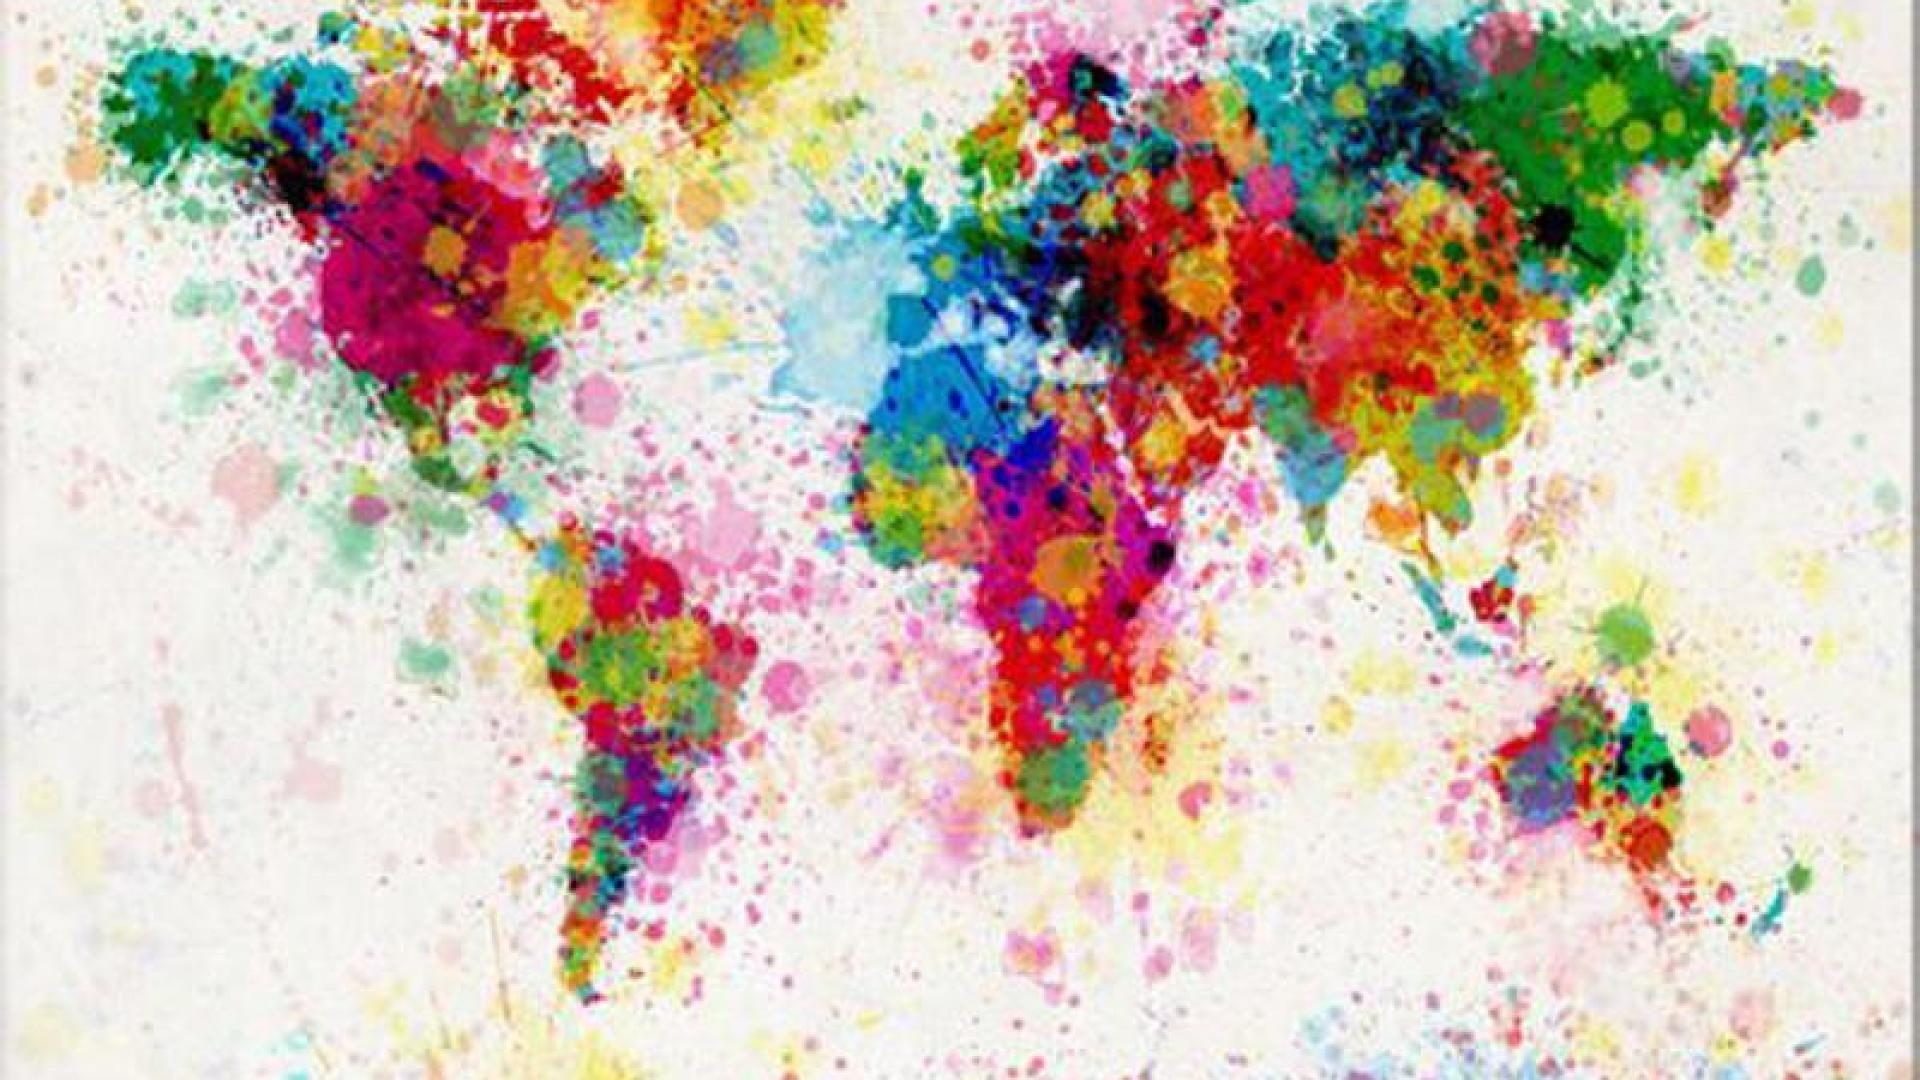 Free Falling In Love Wallpaper Colourful Wallpaper 7856 Hdwpro